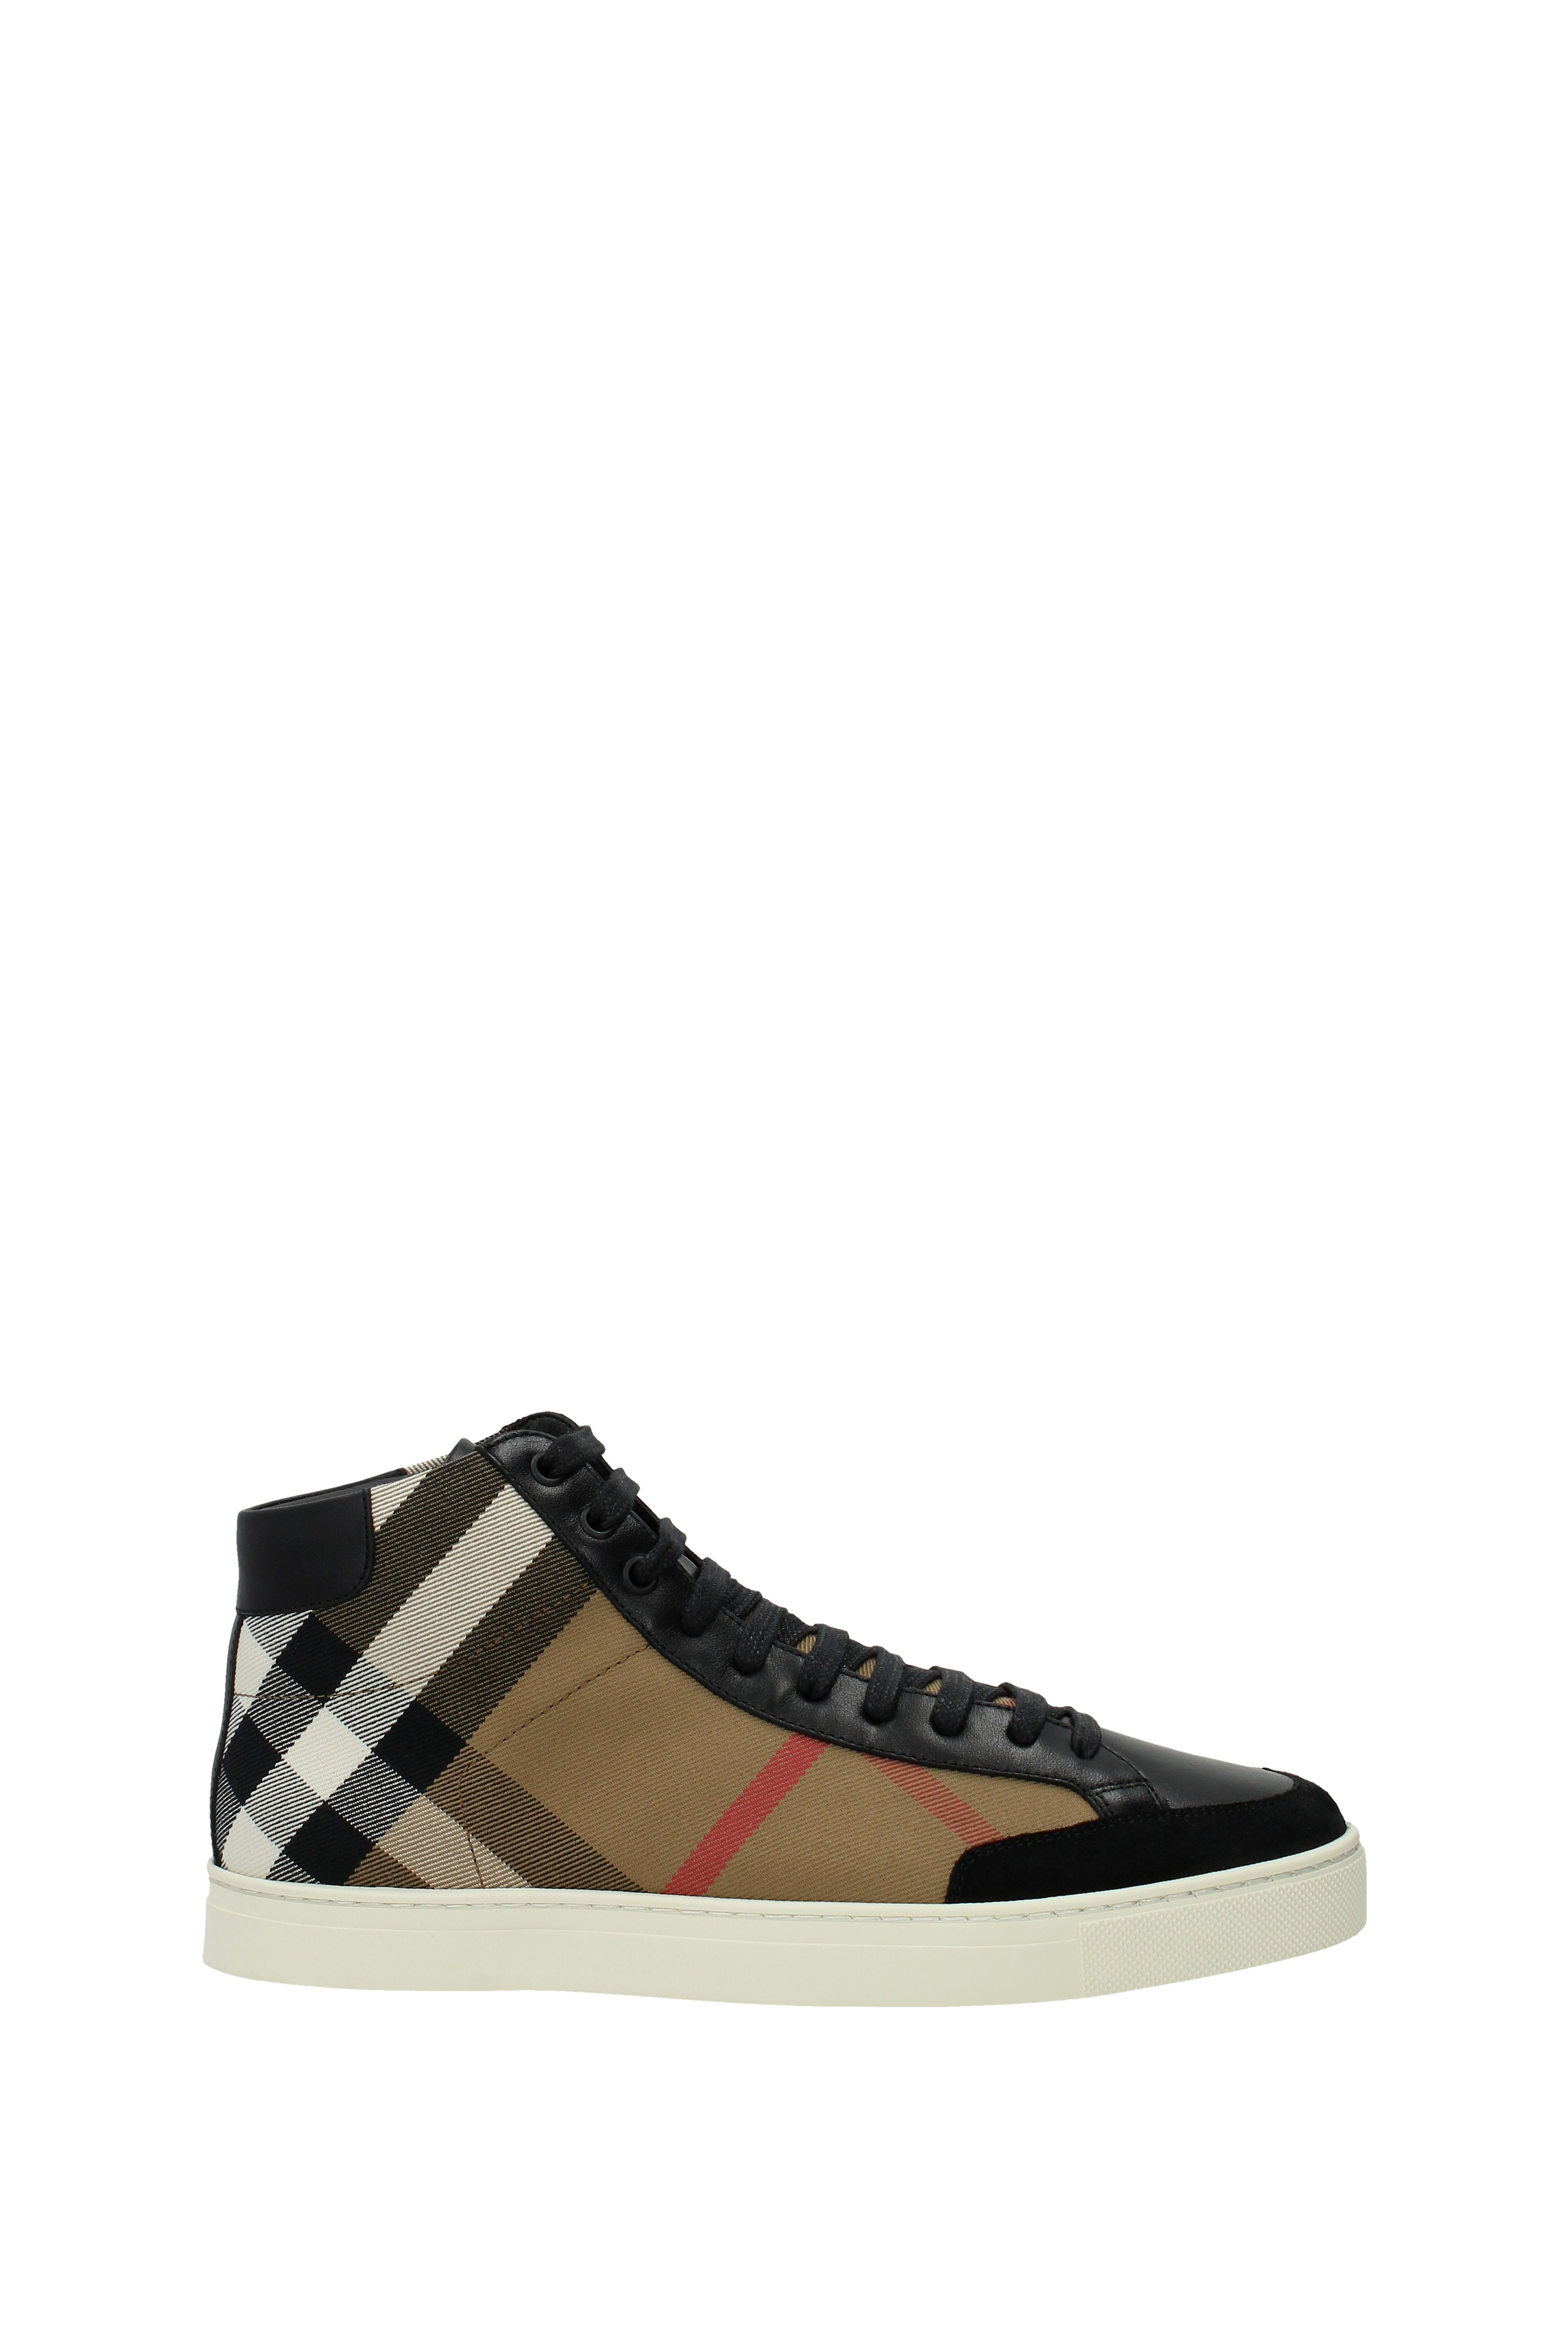 Sneakers Burberry Burberry Burberry hombre - Tessuto (406056) 590021